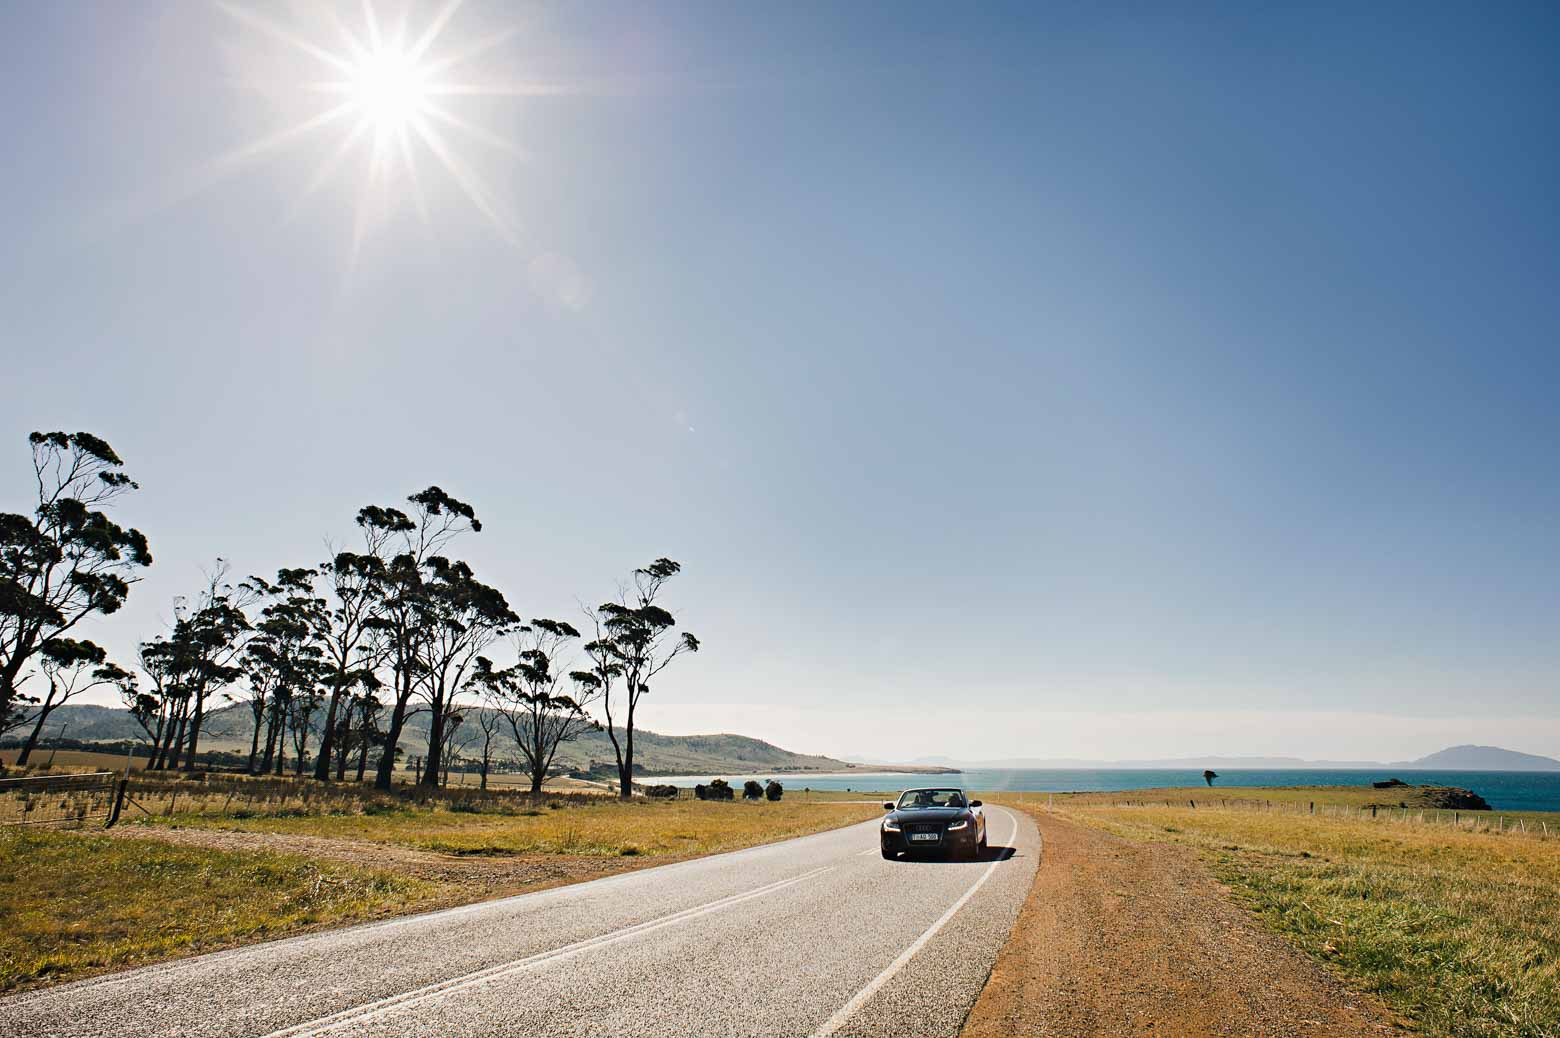 A Lap of Tasmania road trip down the East Coast of Tasmania